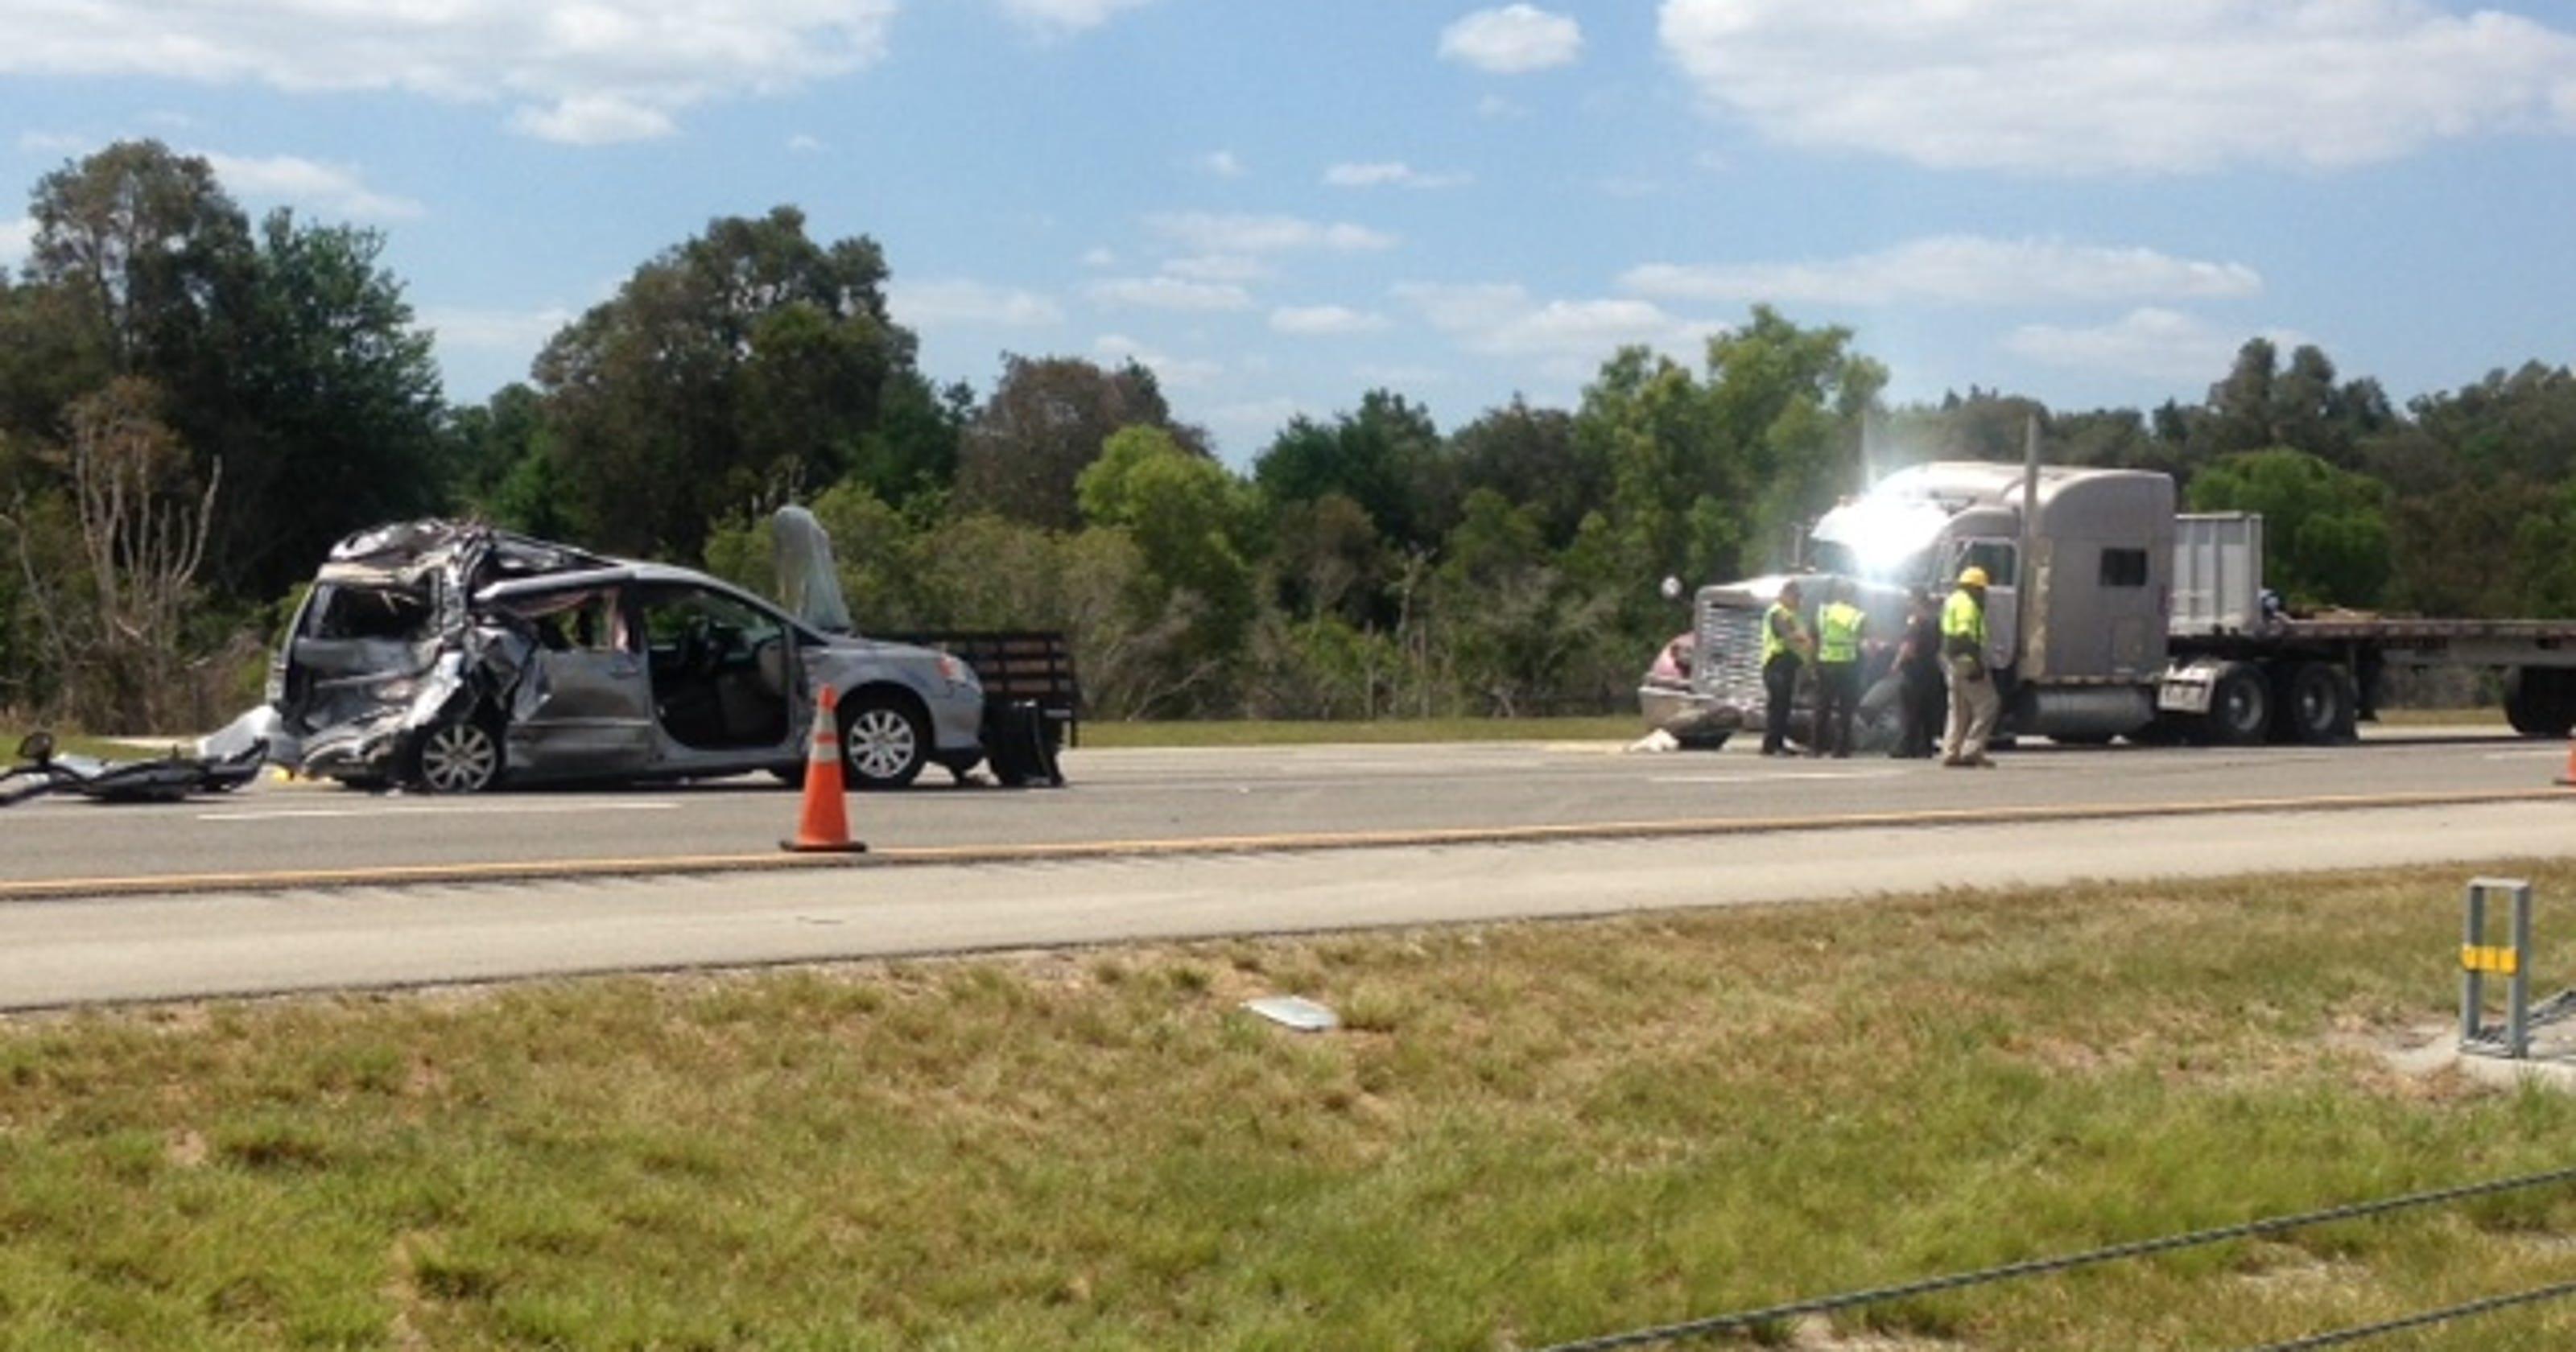 Sarasota man dies in four-vehicle crash on I-75 in Lee County